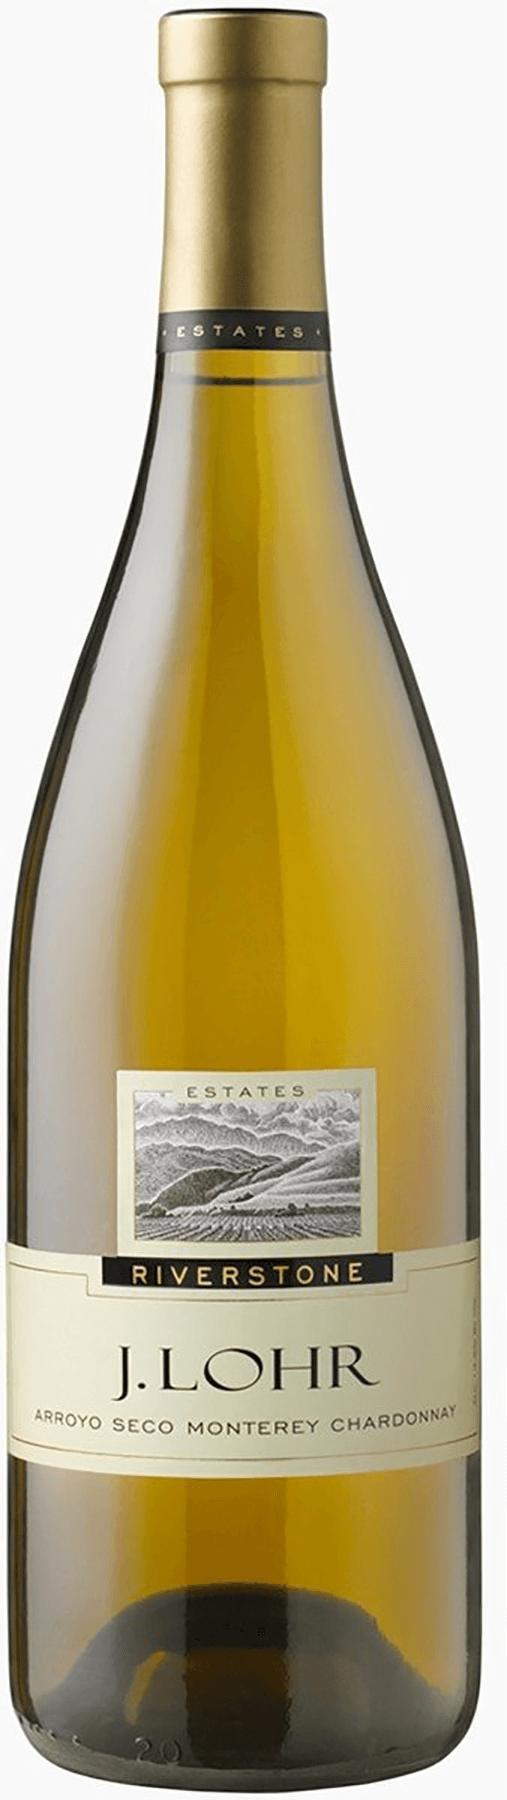 J Lohr Riverstone Chardonnay 2015